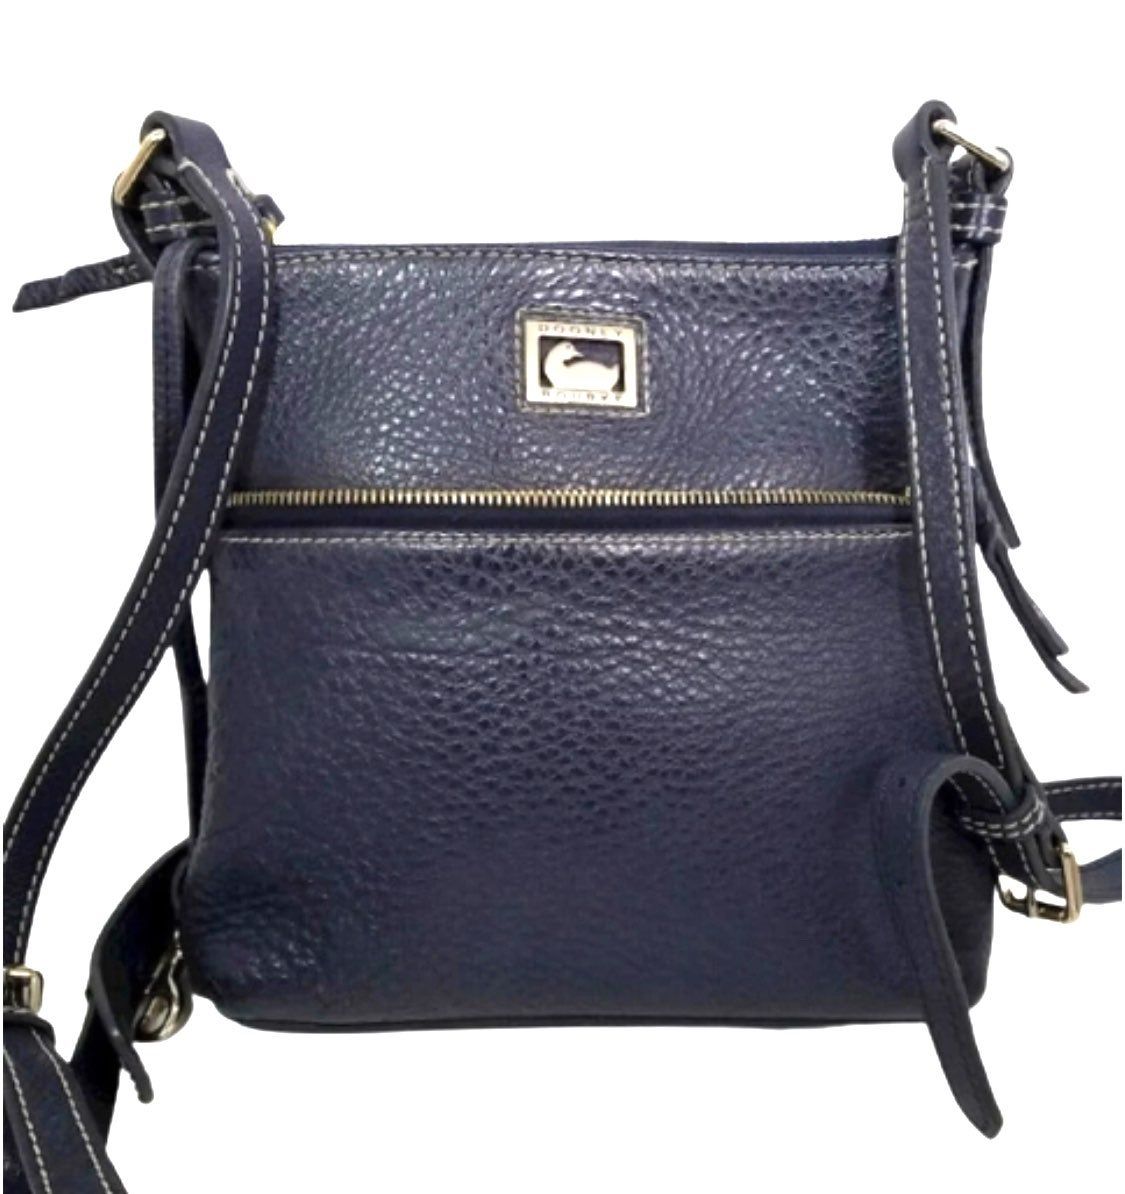 Dooney & Bourke Pebbled Leather Bag